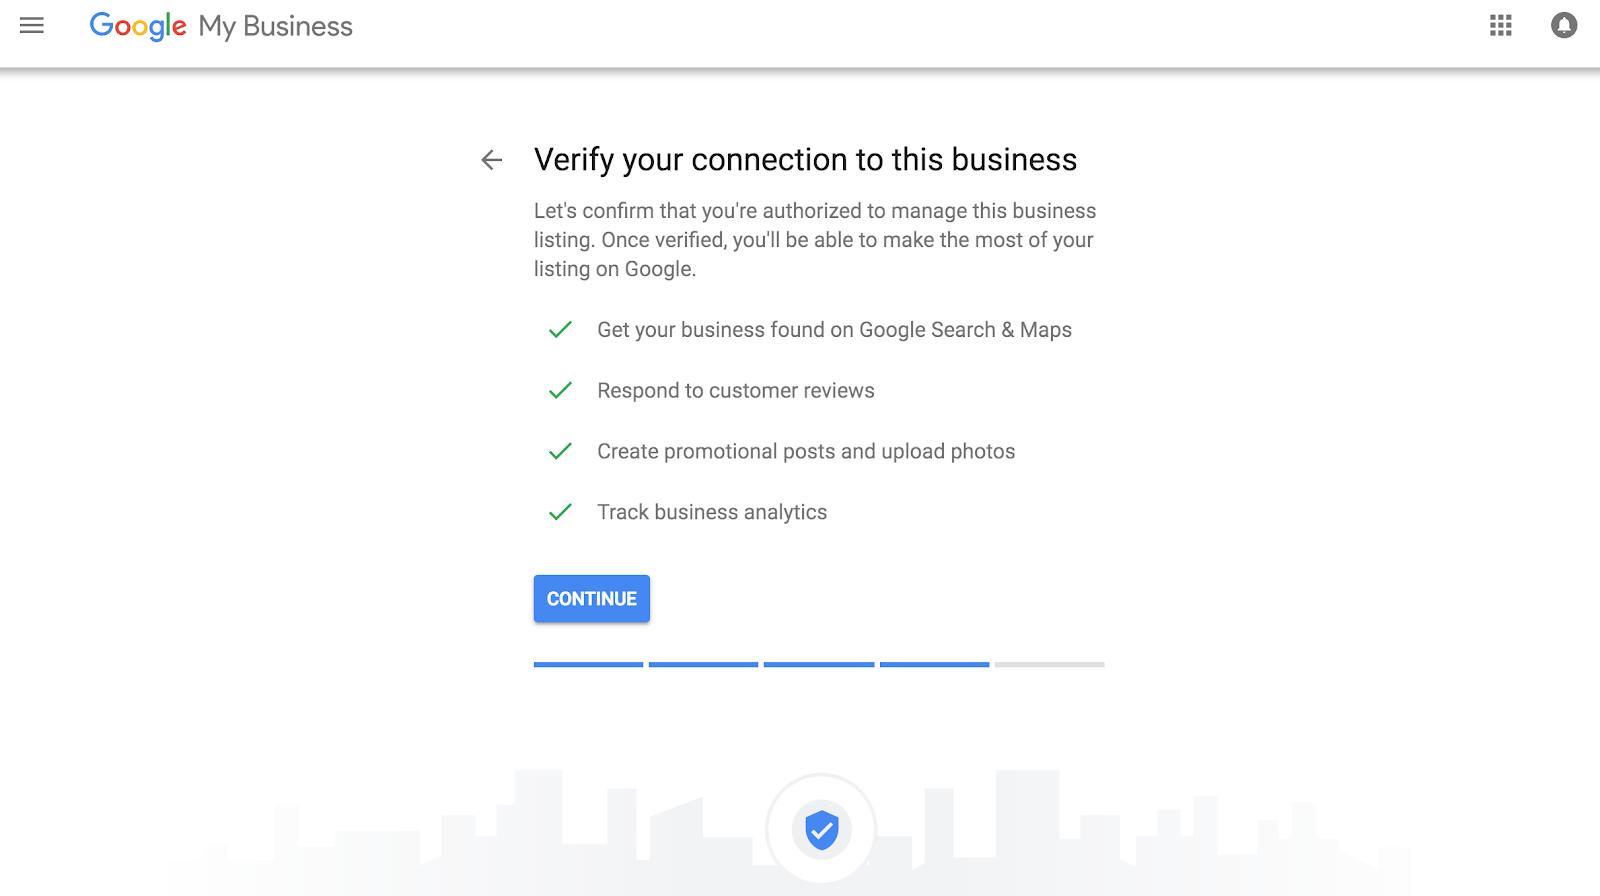 Google My Business - Verification